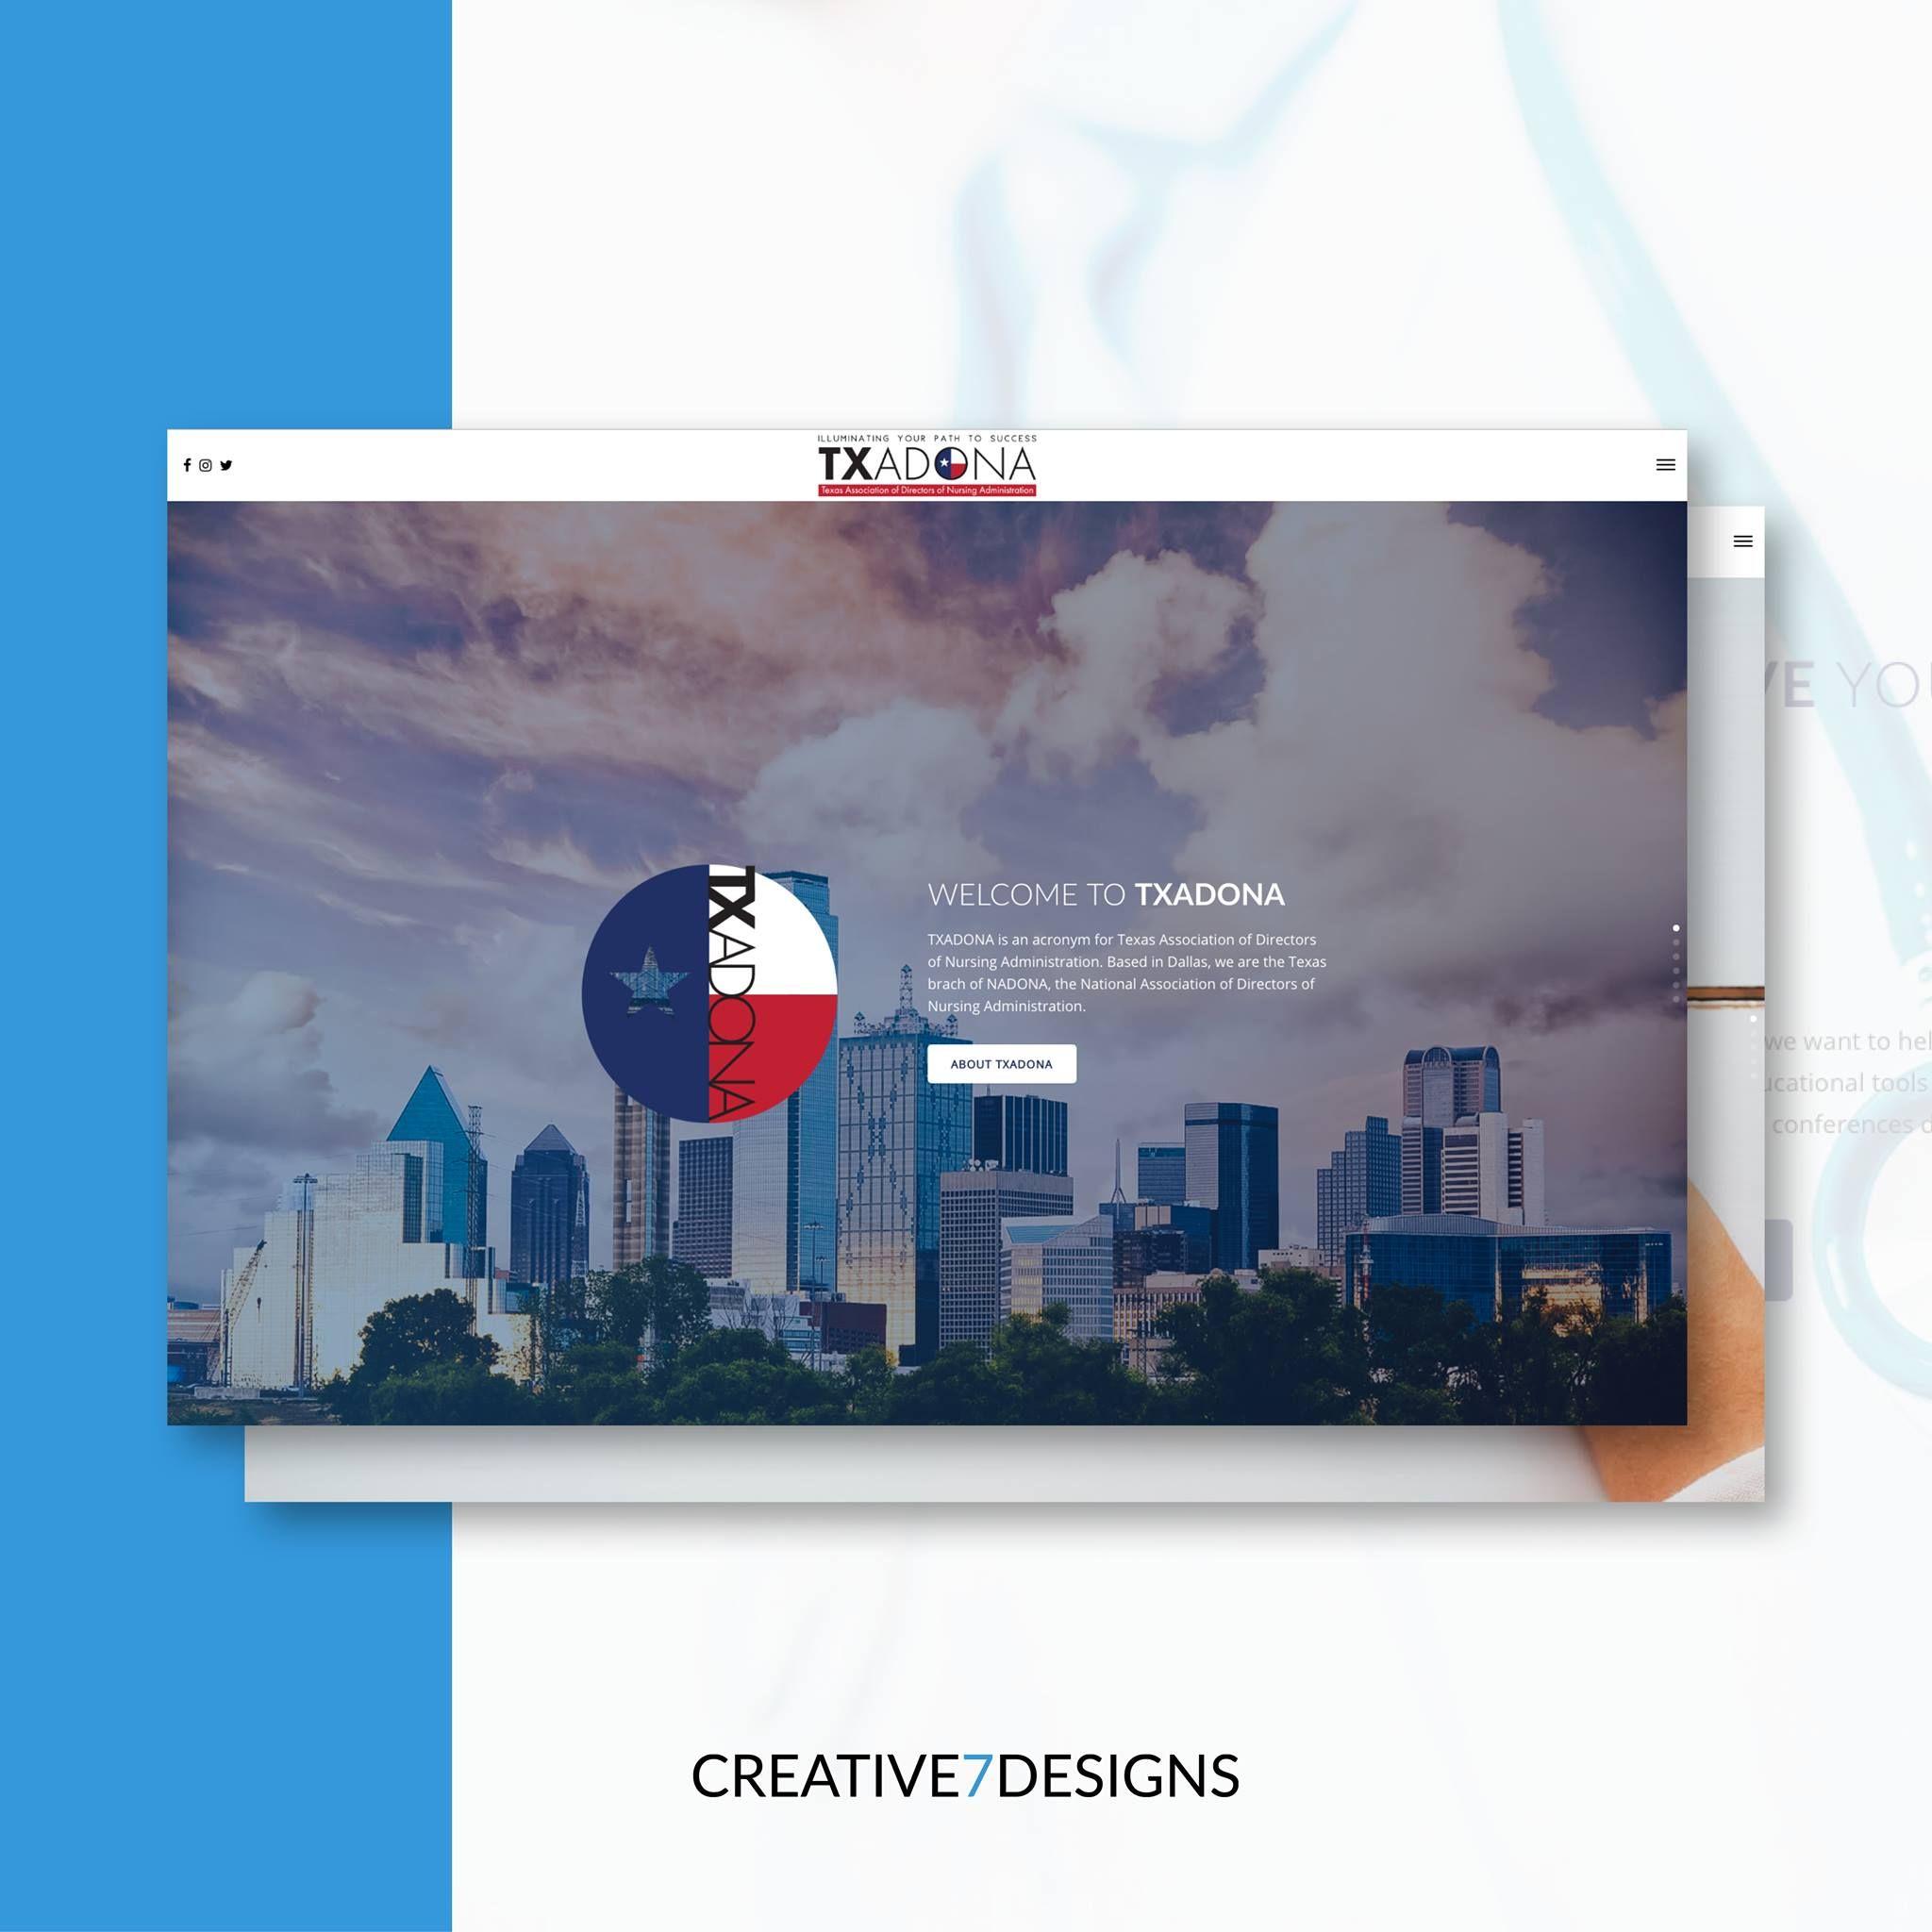 Web Development Digital Marketing Services Aniwebdesigns Texas Instatexas Dallas Digital Marketing Services Digital Marketing Web Development Design